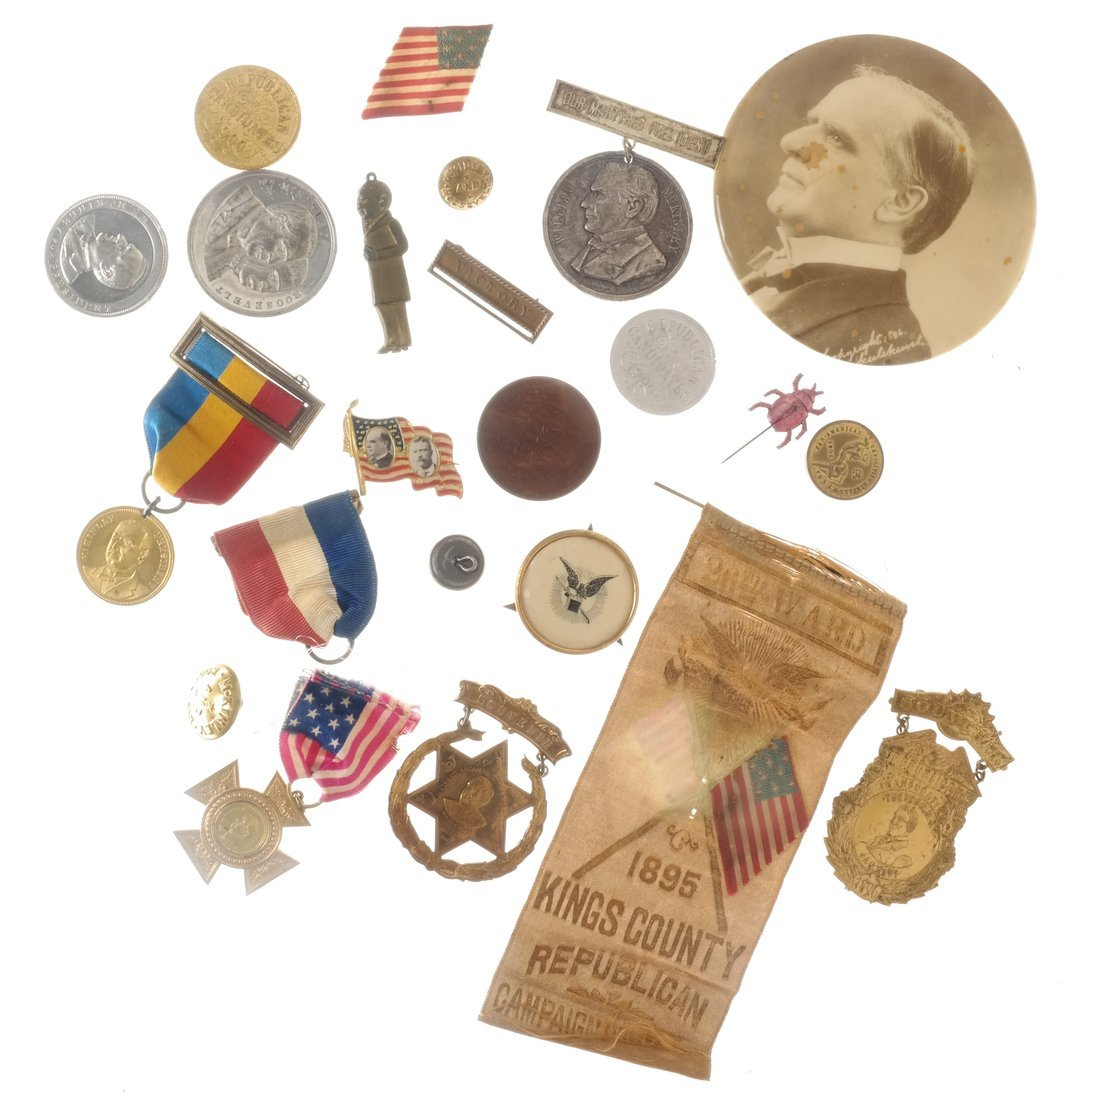 William McKinley - Campaign and Memorial Items